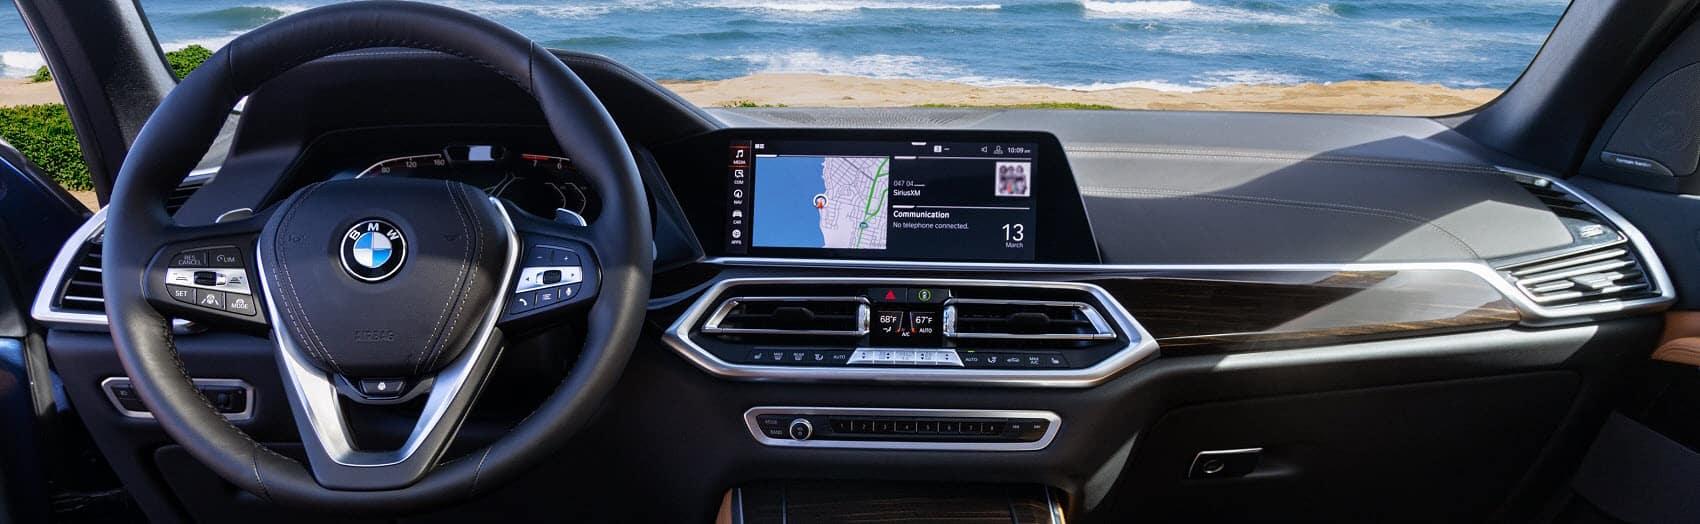 BMW X5 Technology